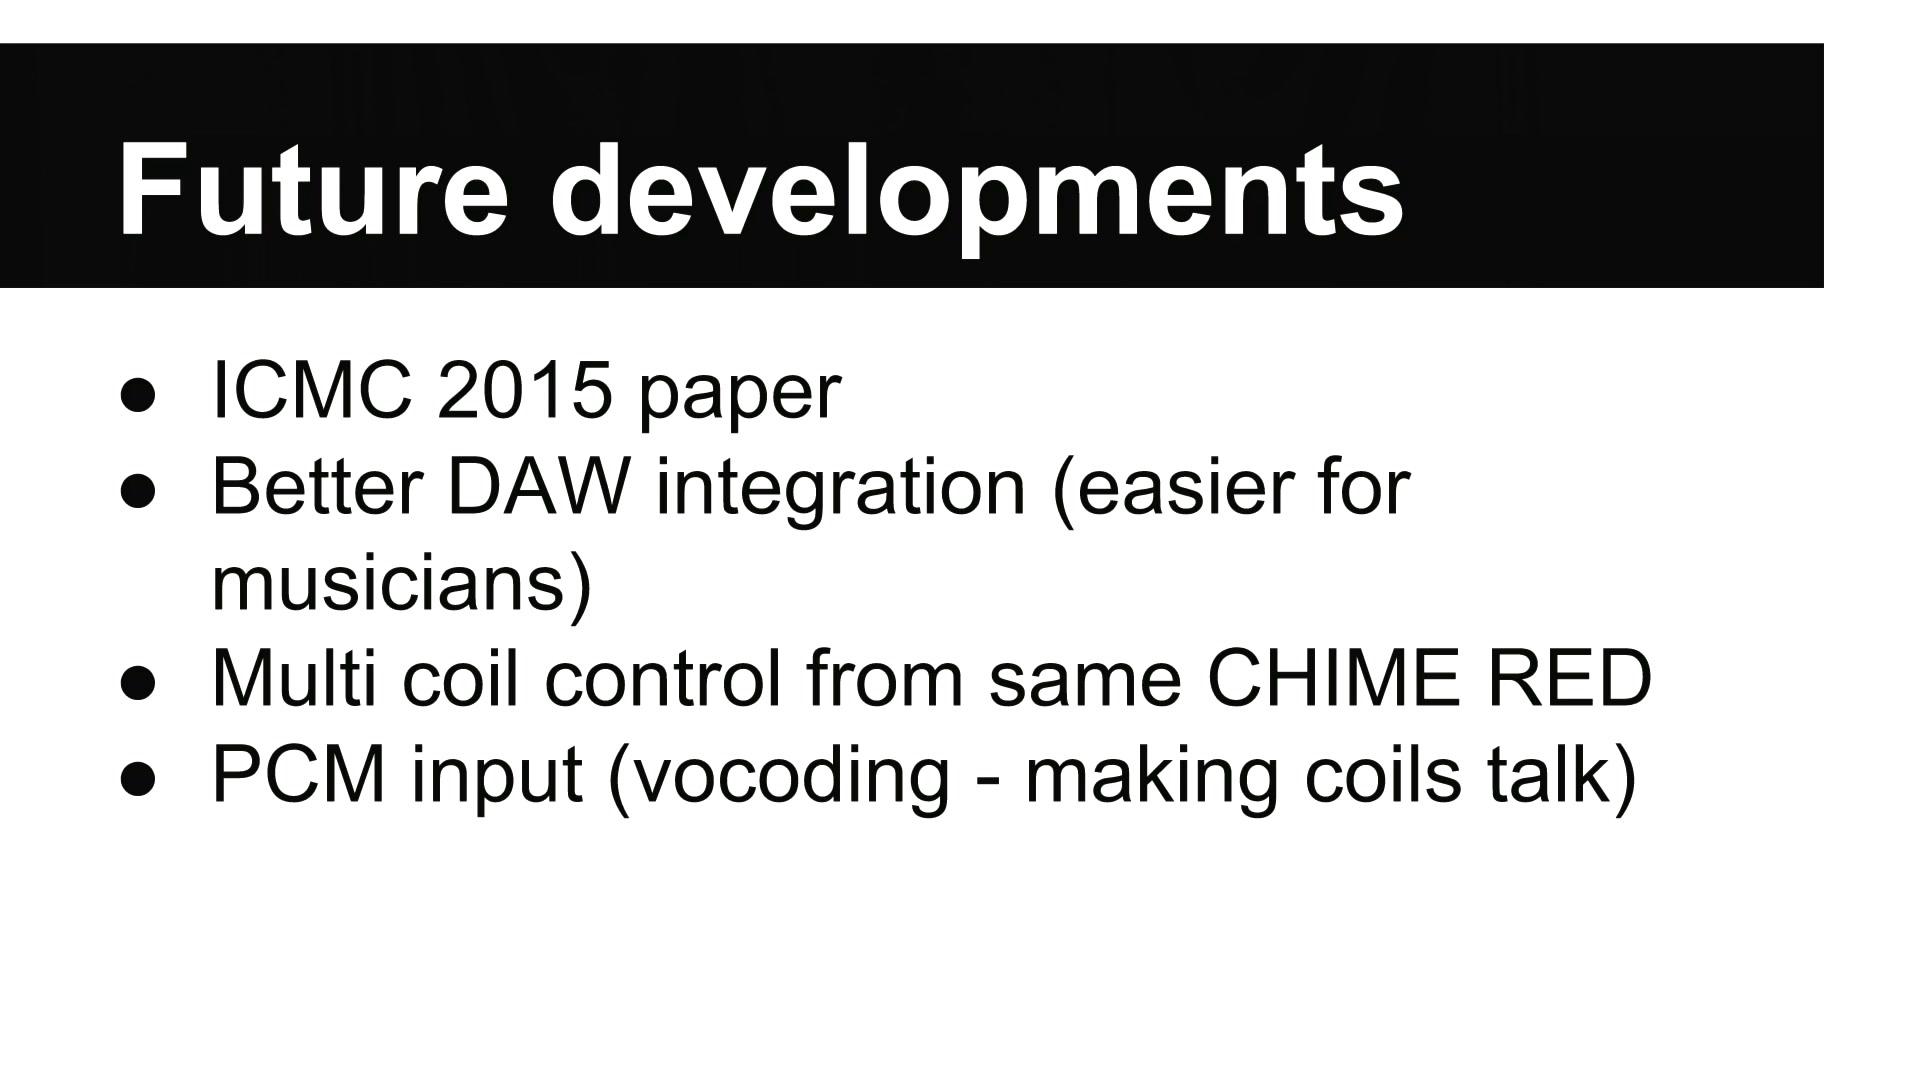 media ccc de - Making coils more musical